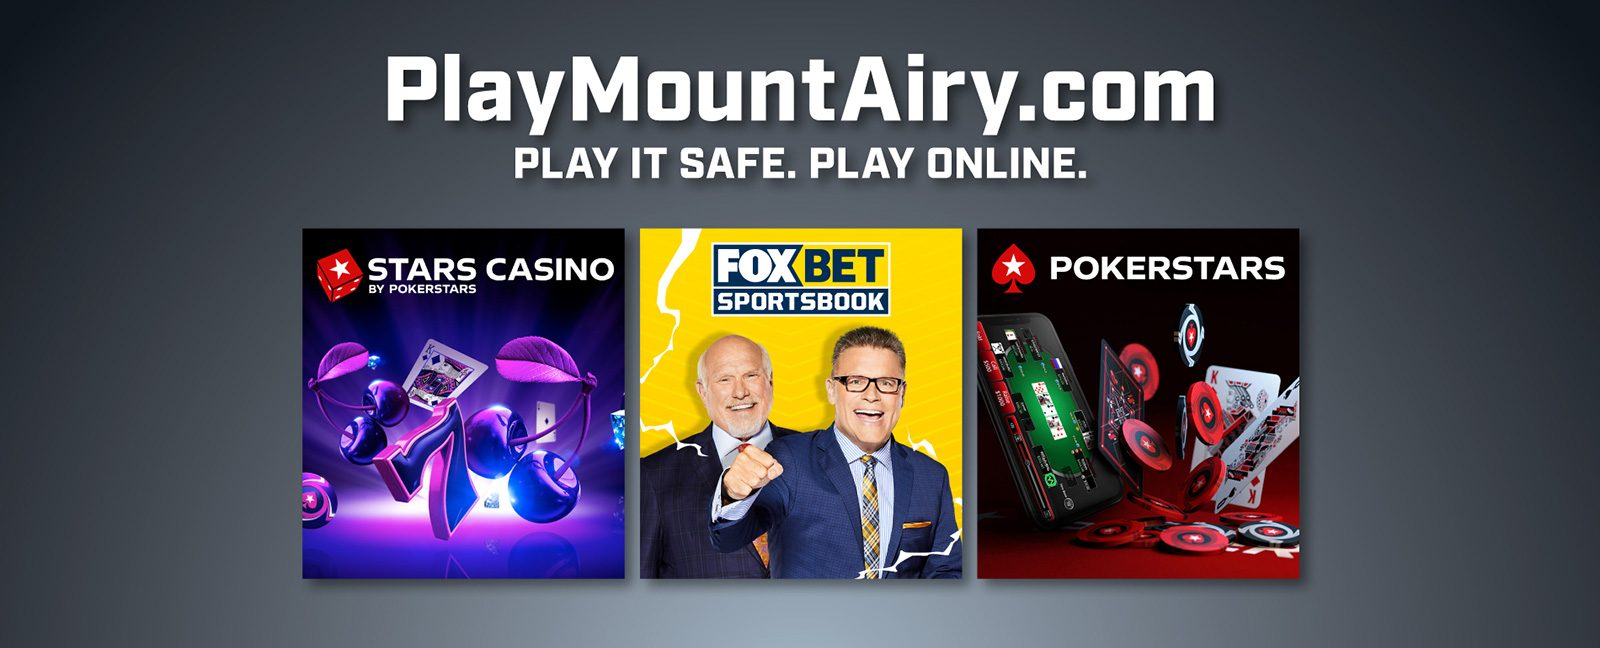 playmountairy.com